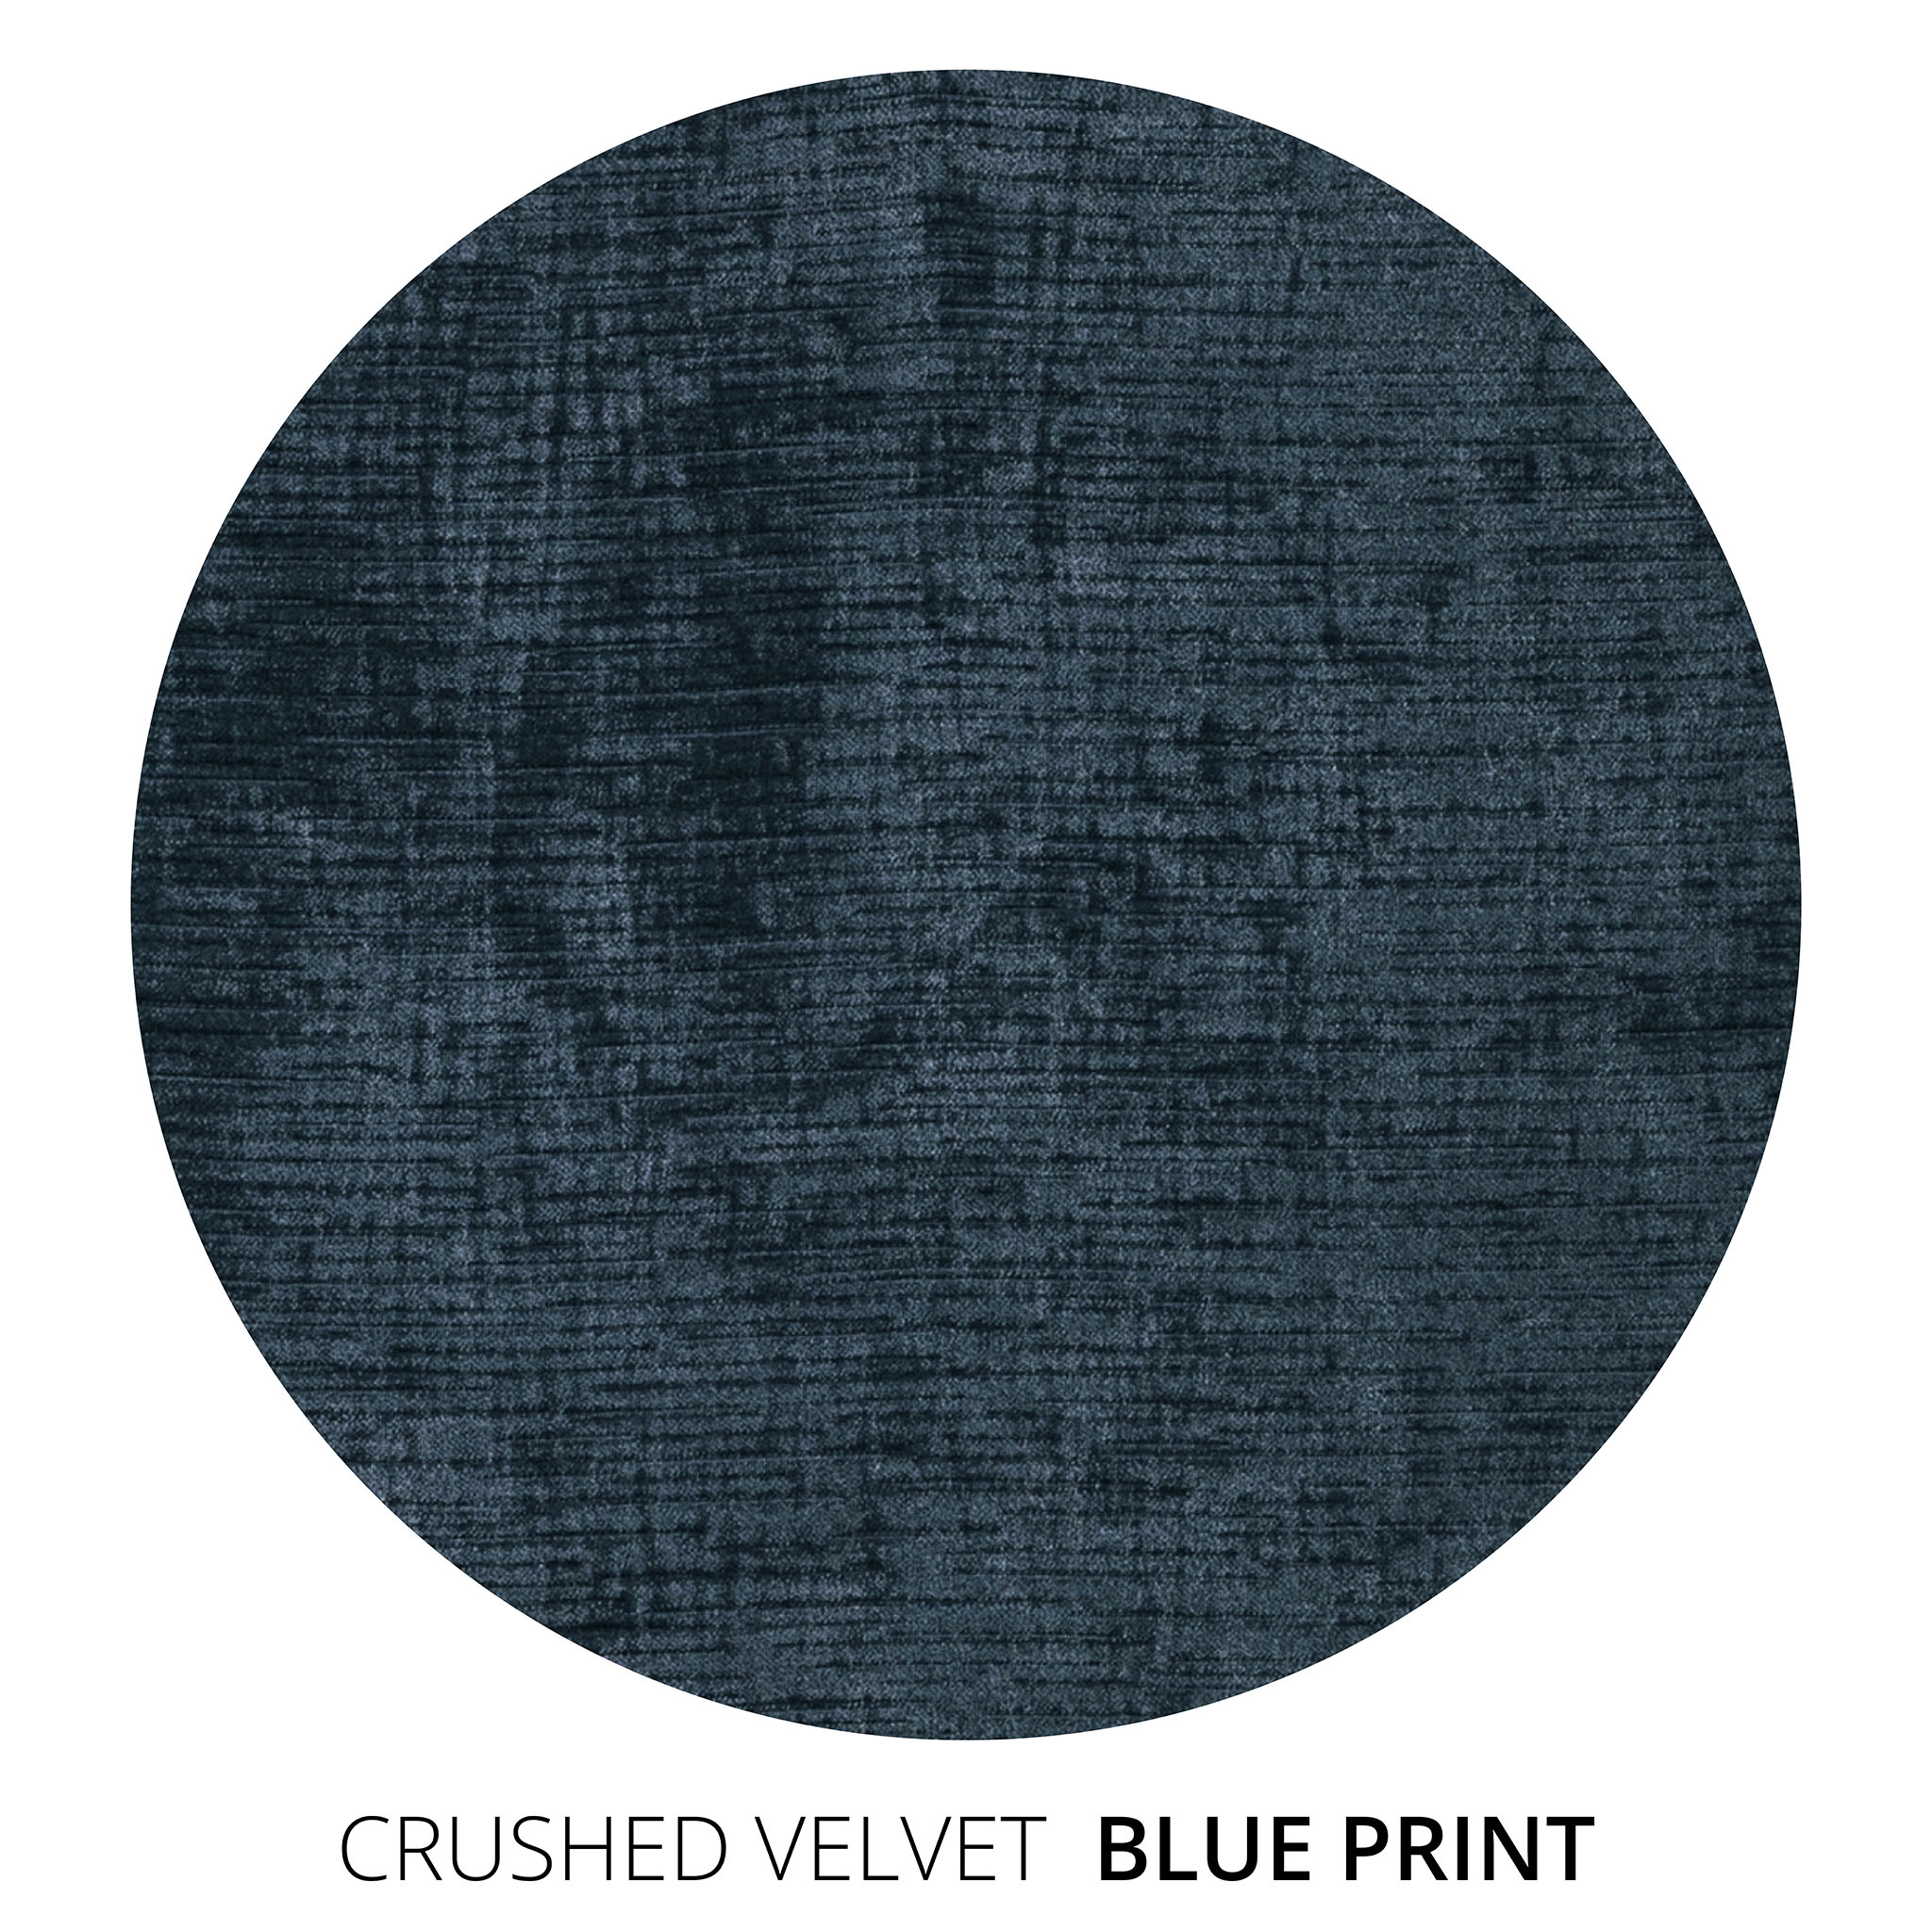 Blue Print Crushed Velvet Swatch